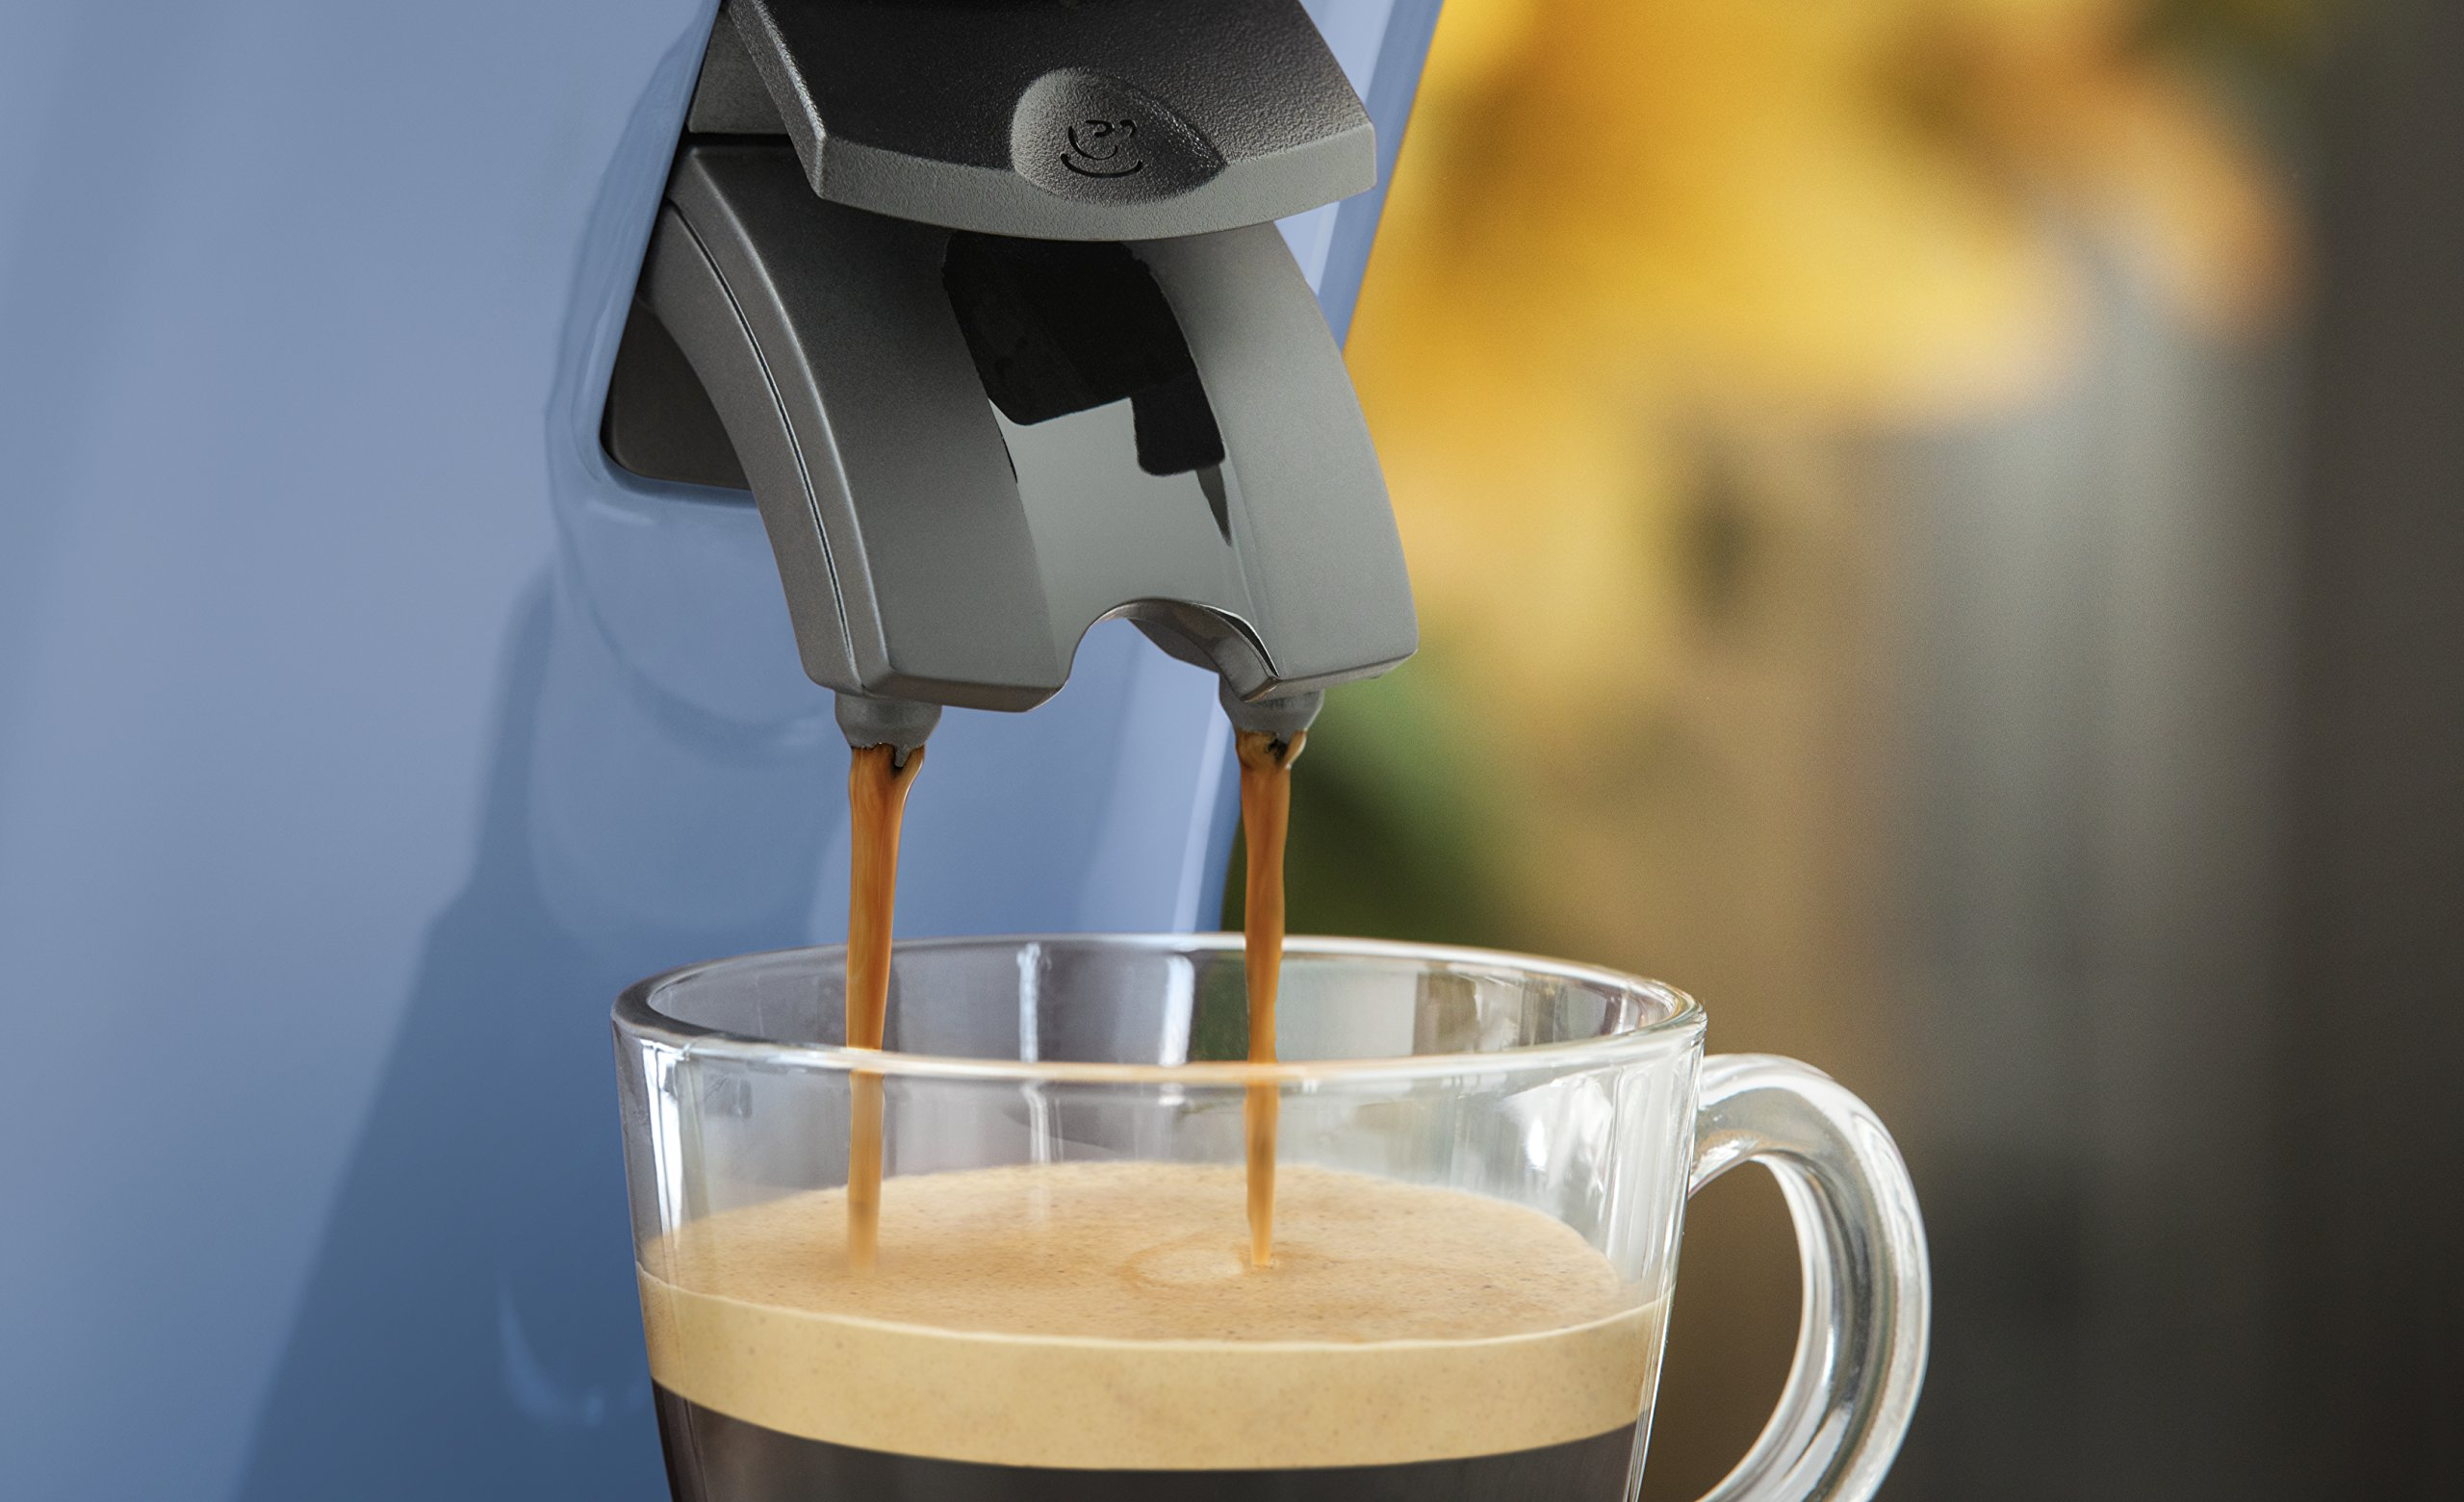 Philips Cafetera Senseo New Original, Elección de crema Plus, grosor de café, color negro azul claro: Amazon.es: Hogar